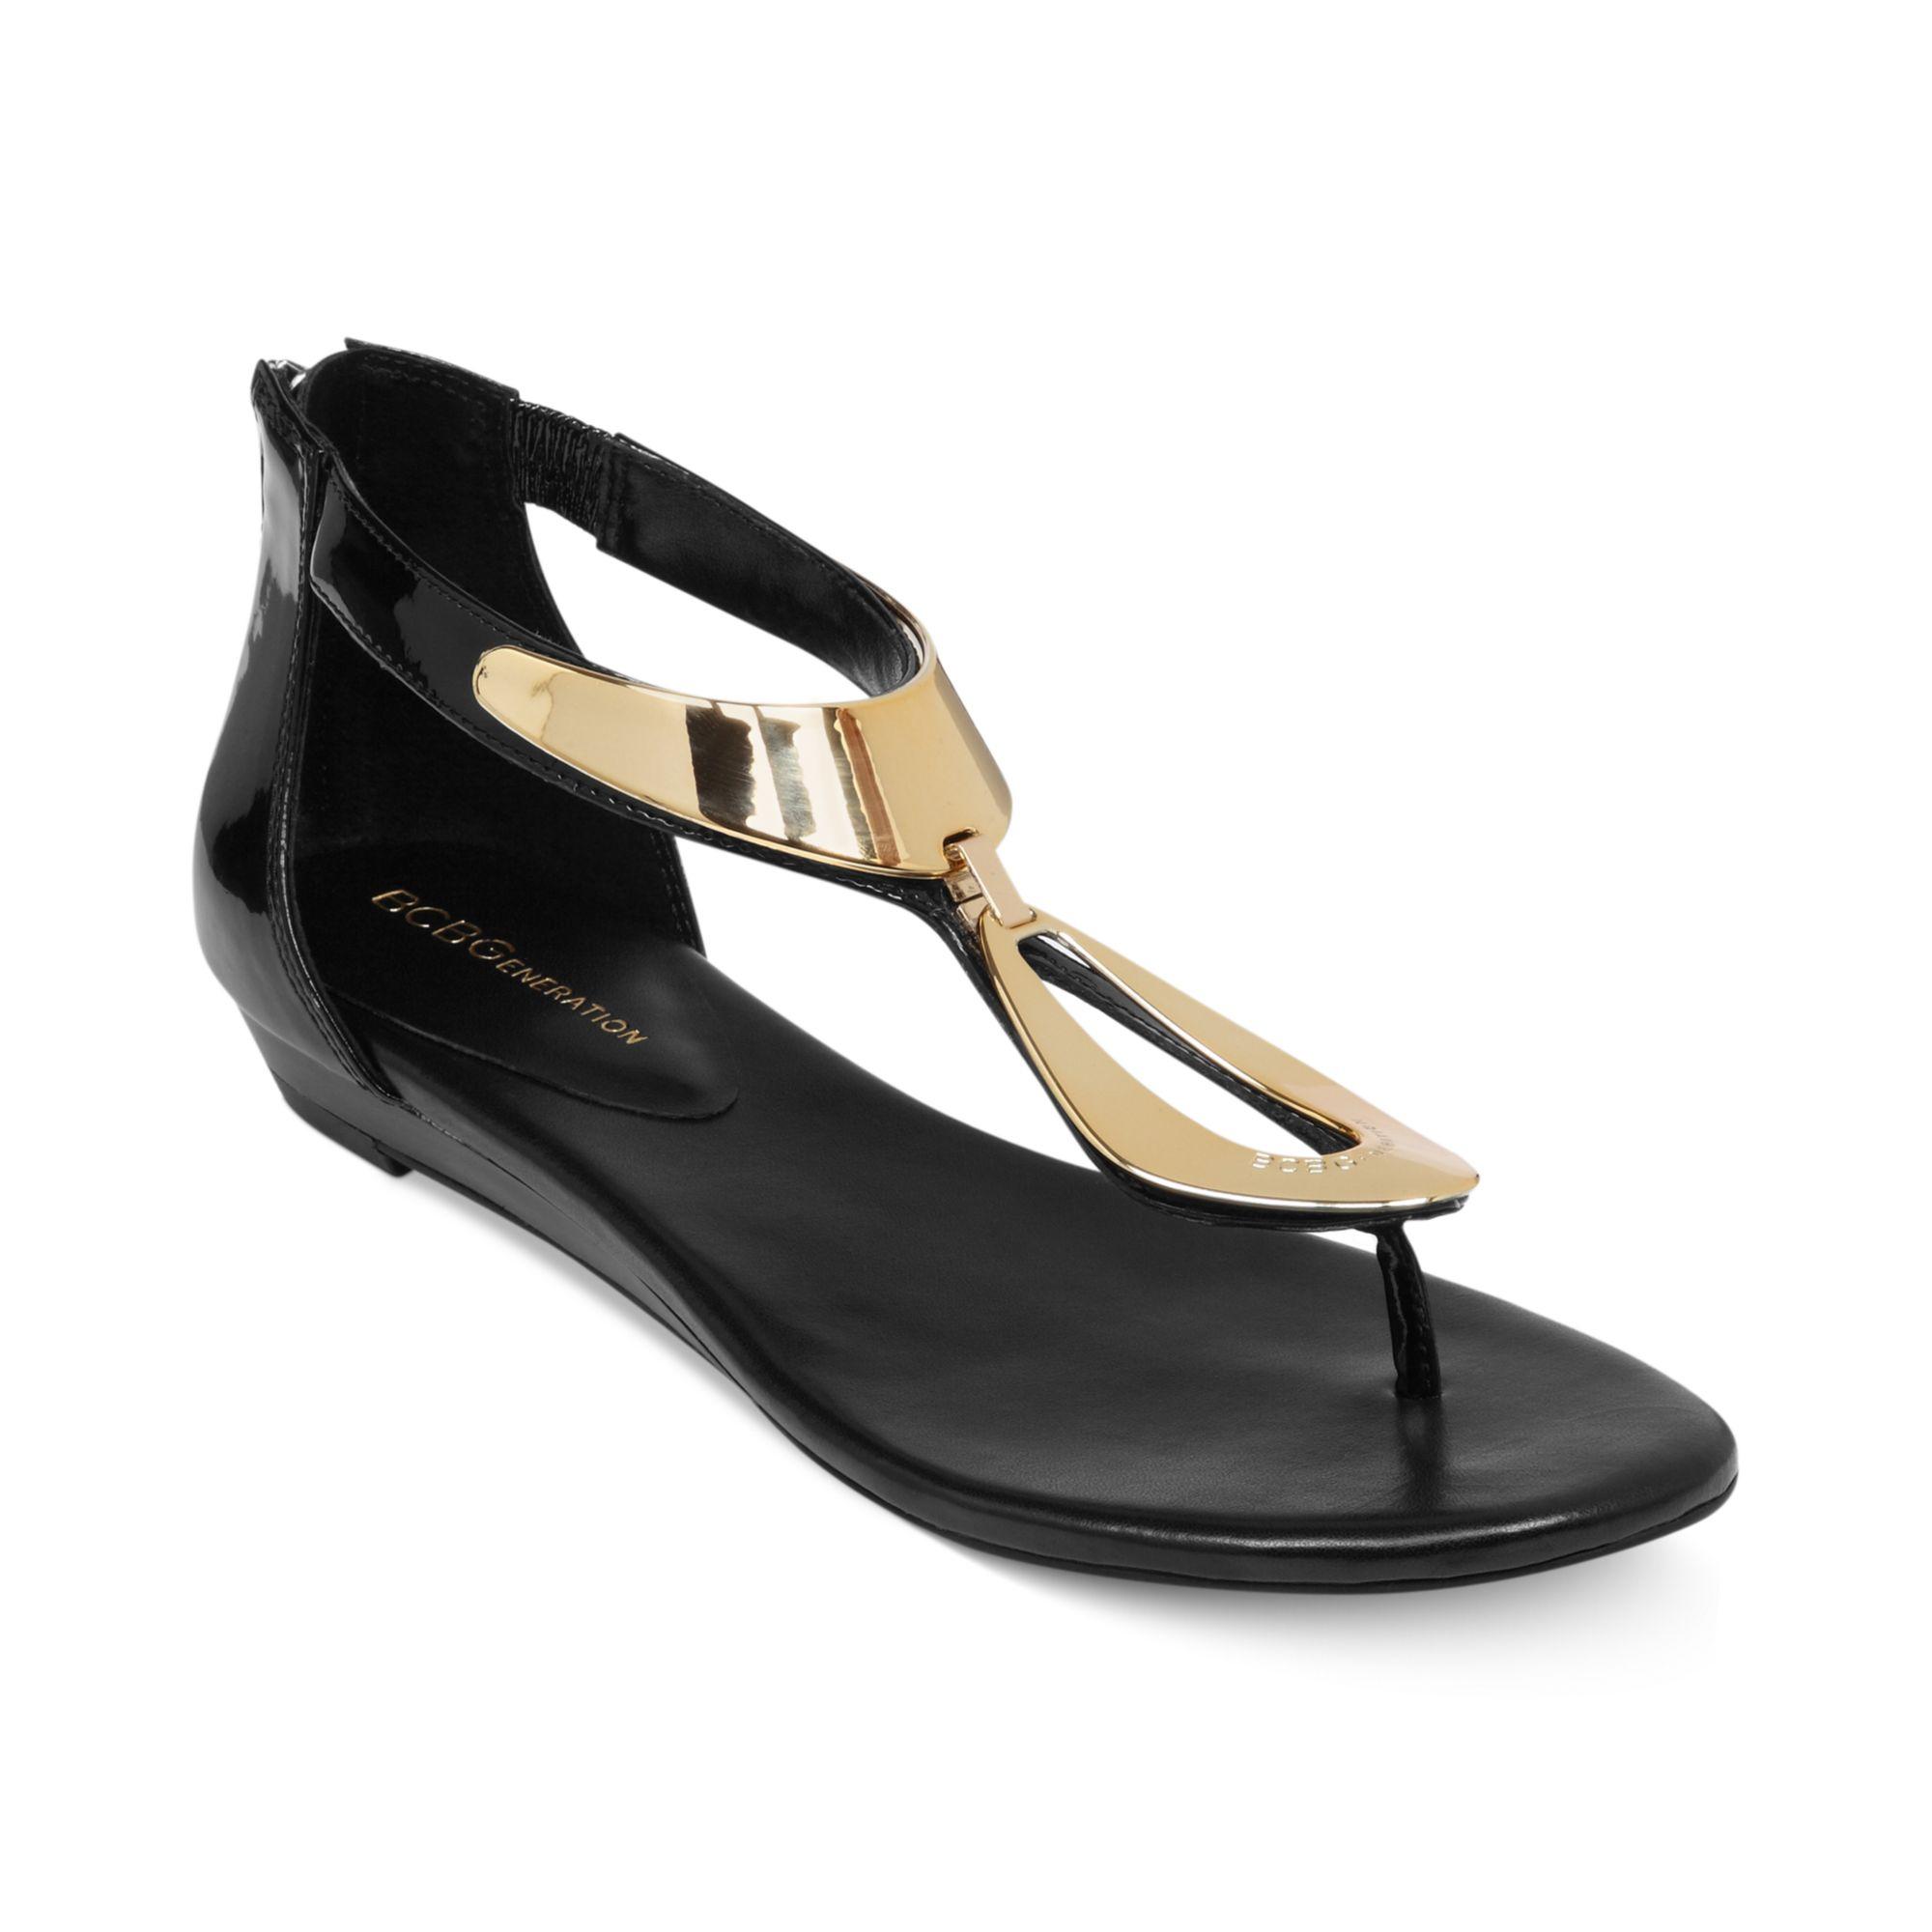 Flat Black Sumpvz Bcbgeneration In Sandals Thong Anais Lyst cJKTlF13